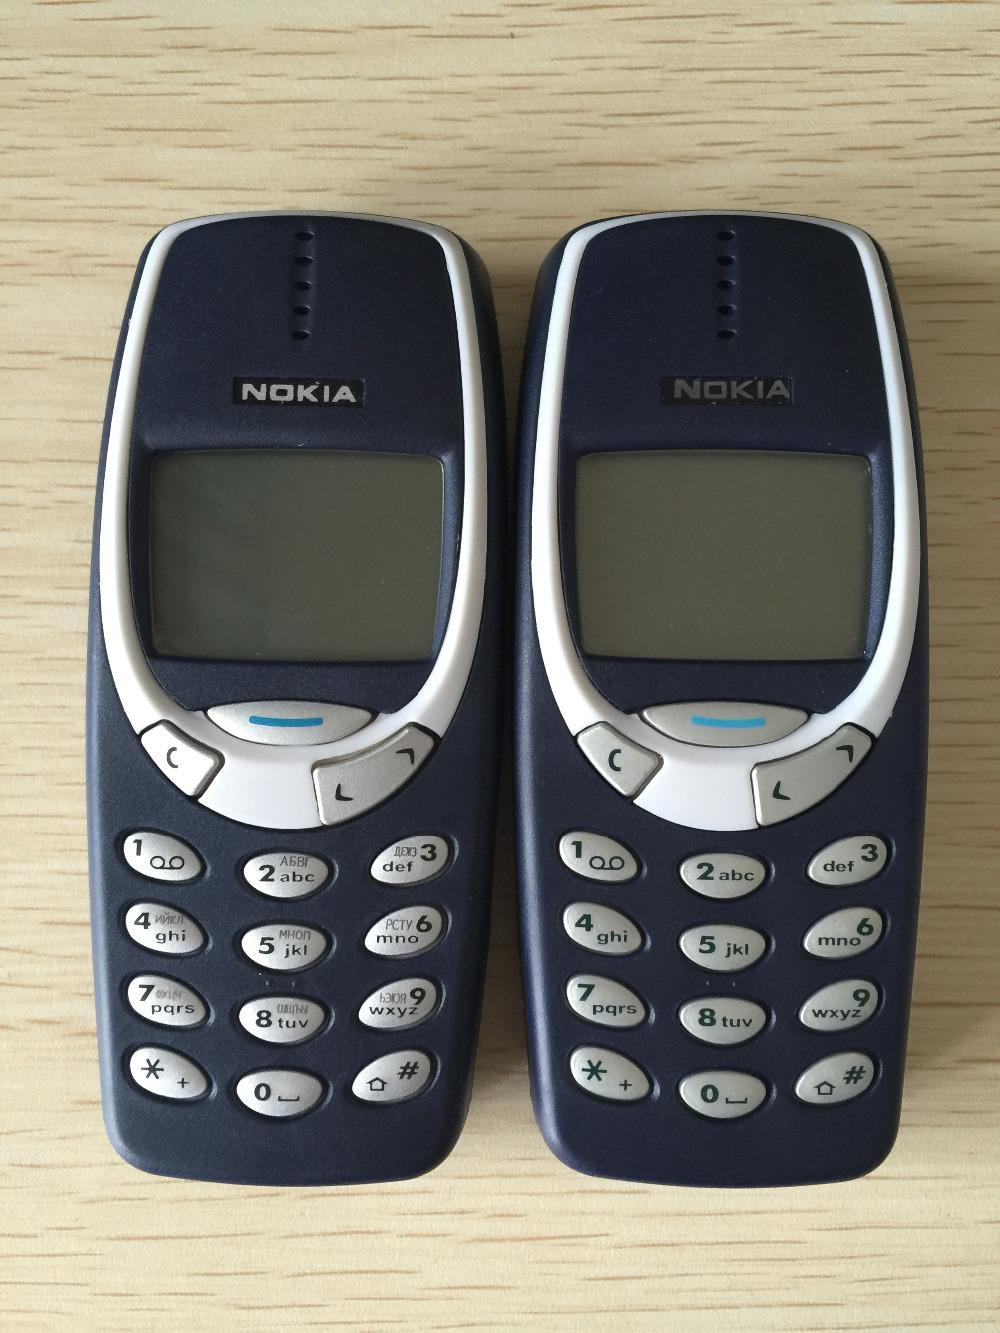 Refurbished phone Nokia 3310 cheap phone unlocked GSM 900/1800 with multi language dark blue 2